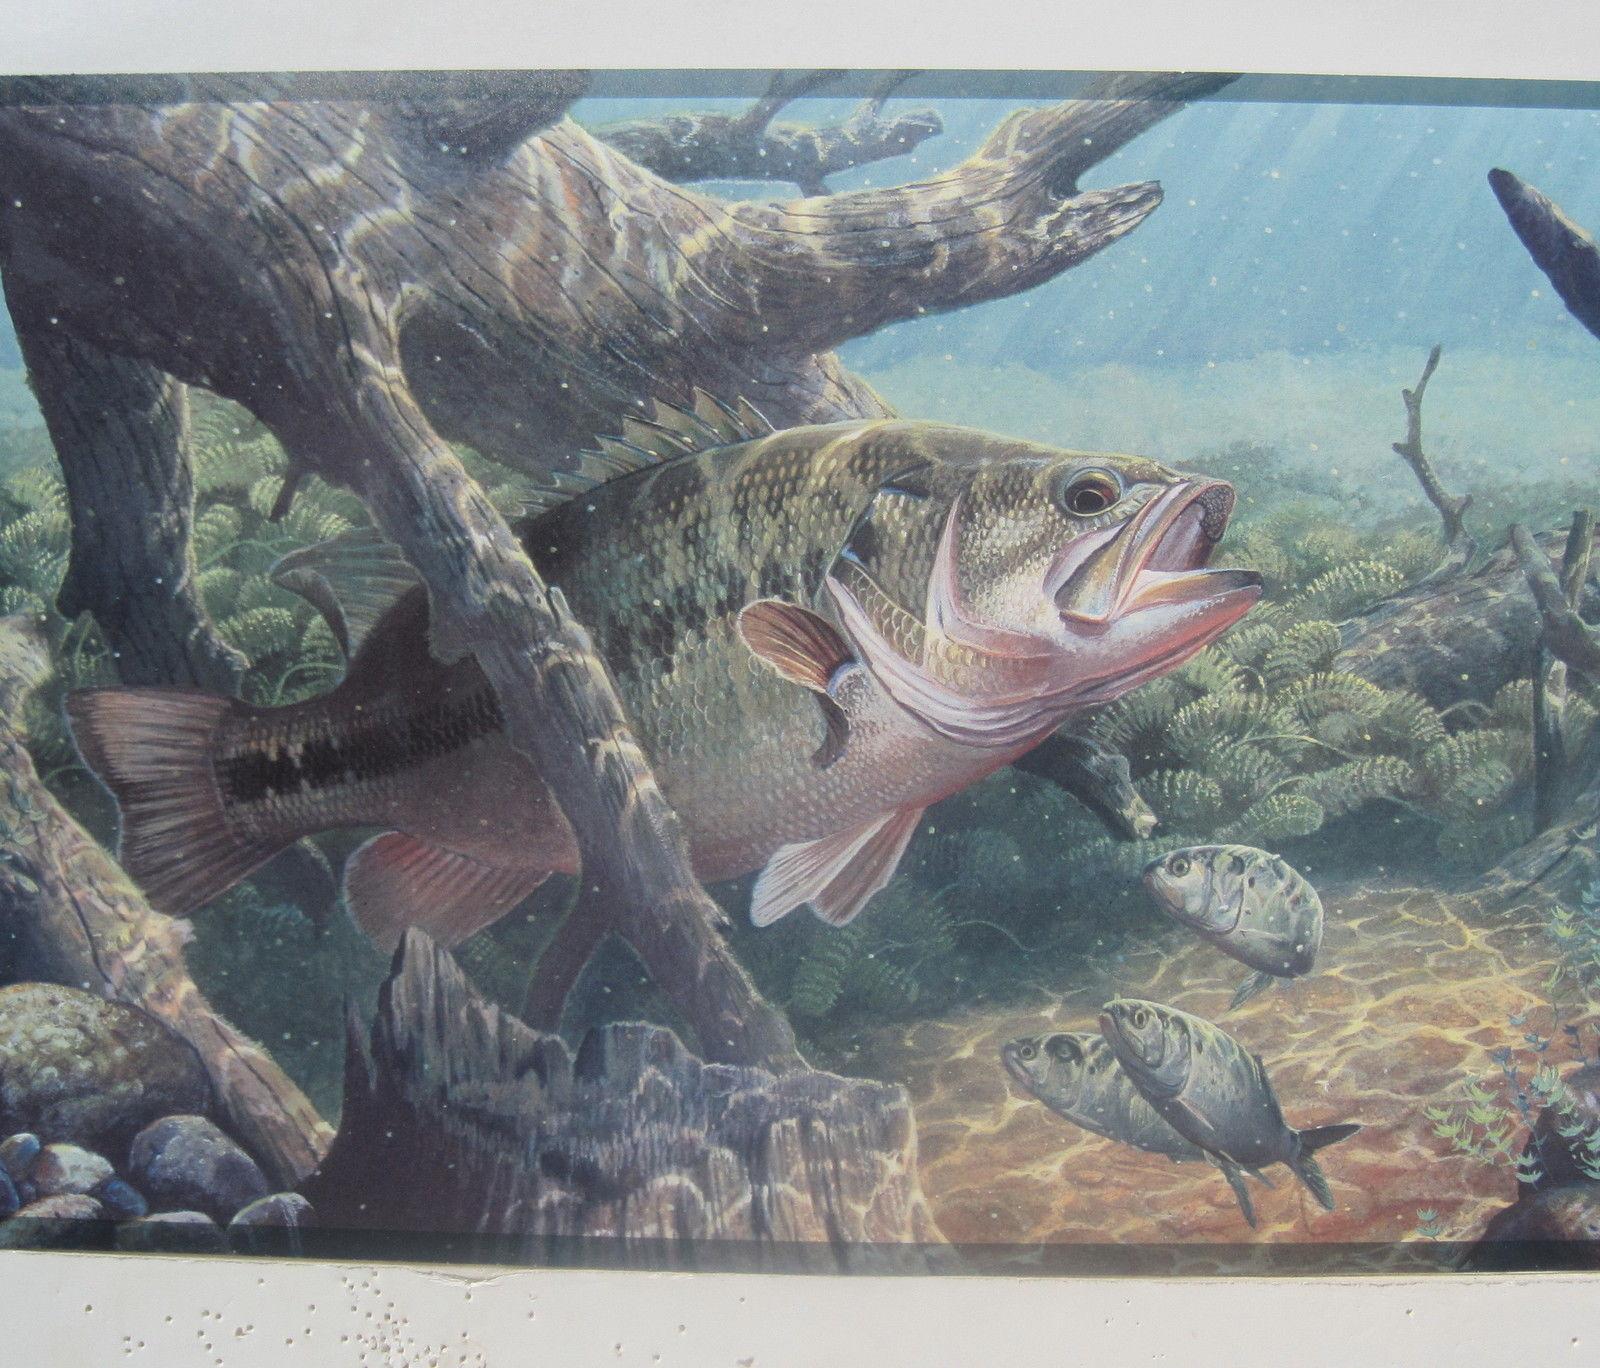 BASS FISHING FRESH WATER FISHING Wallpaper Border 9 57jpg 1600x1368